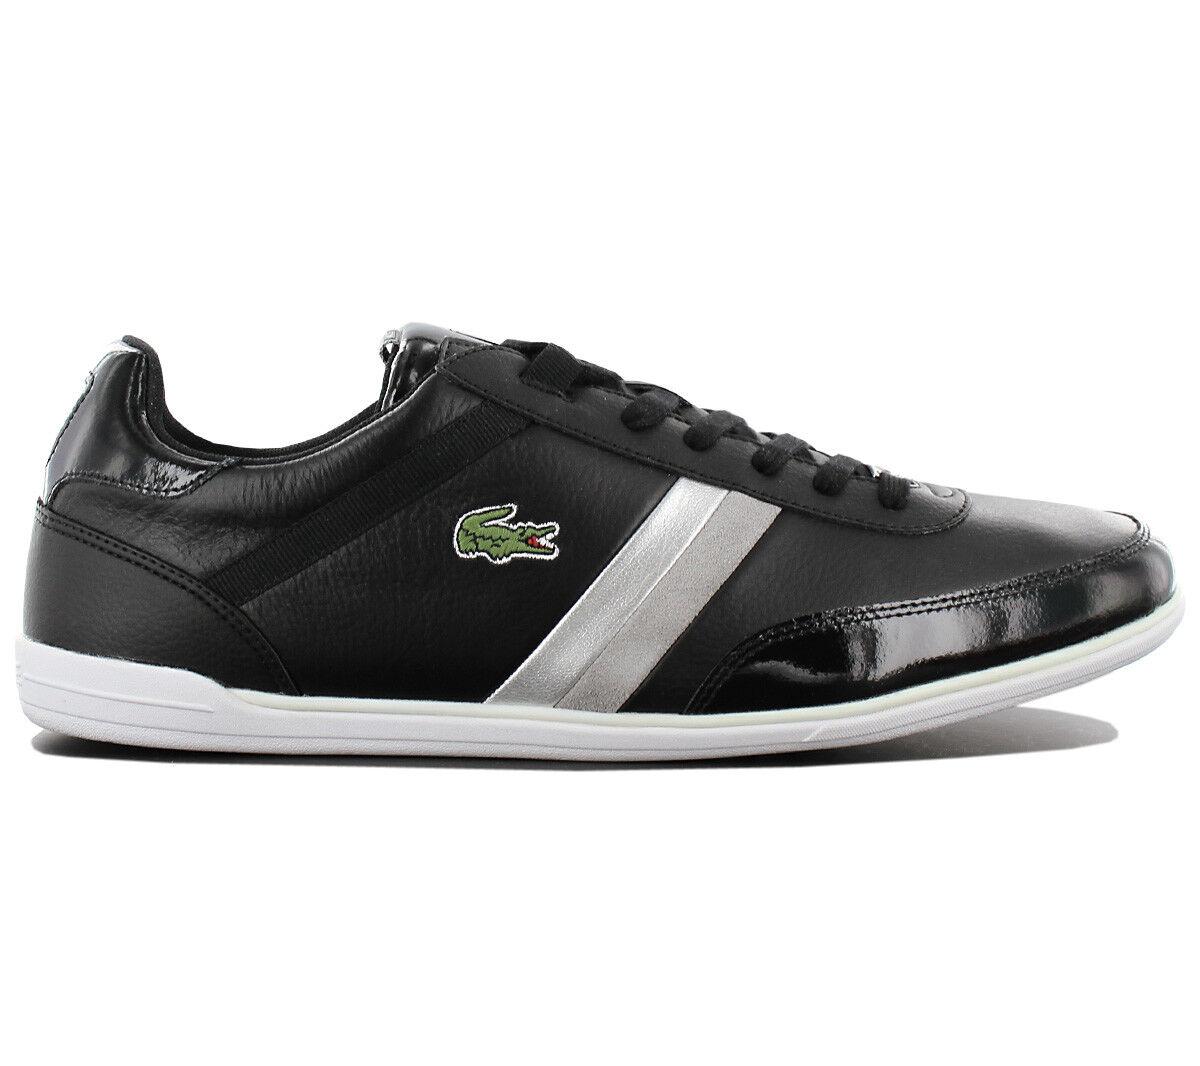 LACOSTE Girón SLX SPM Uomo Sneaker Turn Scarpe in pelle fashion Turn Sneaker Scarpa 27spm3027231 3f377b